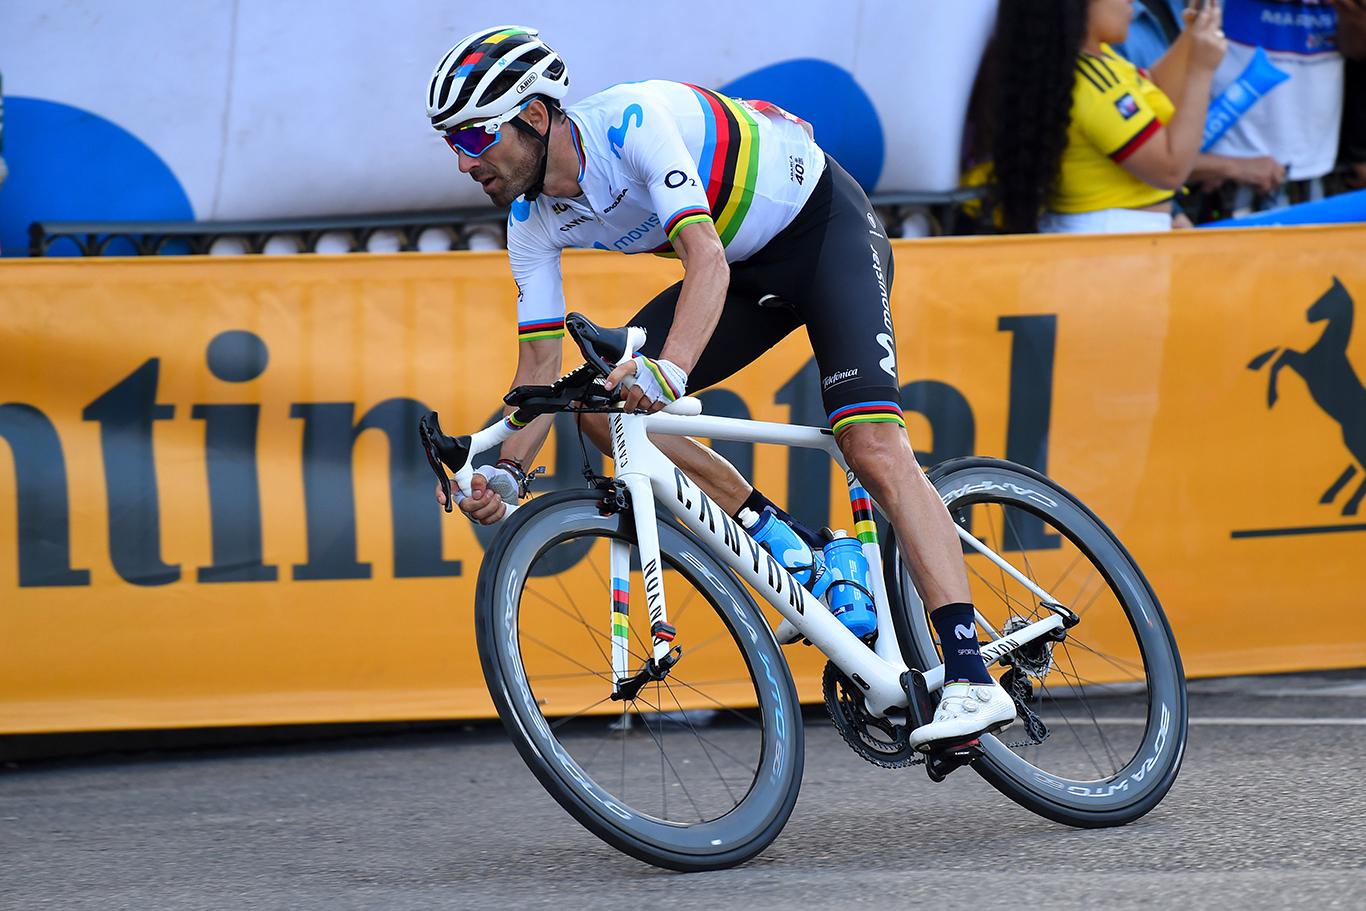 Vuelta Espana 2019 - 74th Edition - 21th stage Fuenlabrada - Madrid 106,6 km - 15/10/2019 - Alejandro Valverde (ESP - Movistar Team) - photo Dario Belingheri/BettiniPhoto©2019